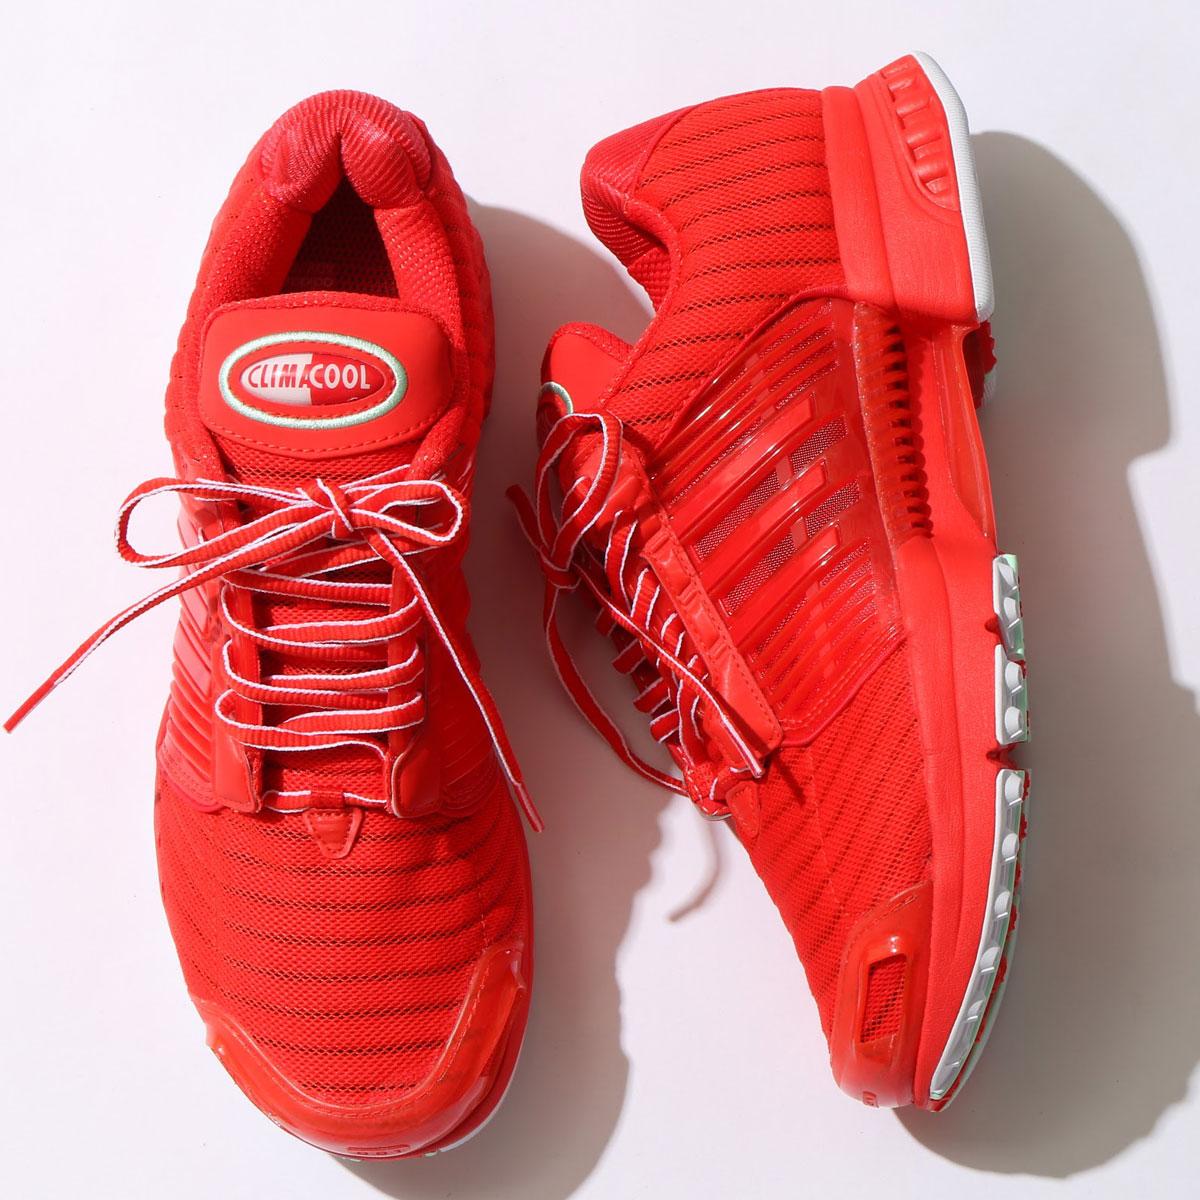 adidas Originals CLIMACOOL 1 (アディダス クライマクール 1) CORE RED/CORE RED/RUNNING WHITE【メンズ レディース スニーカー】17SS-I